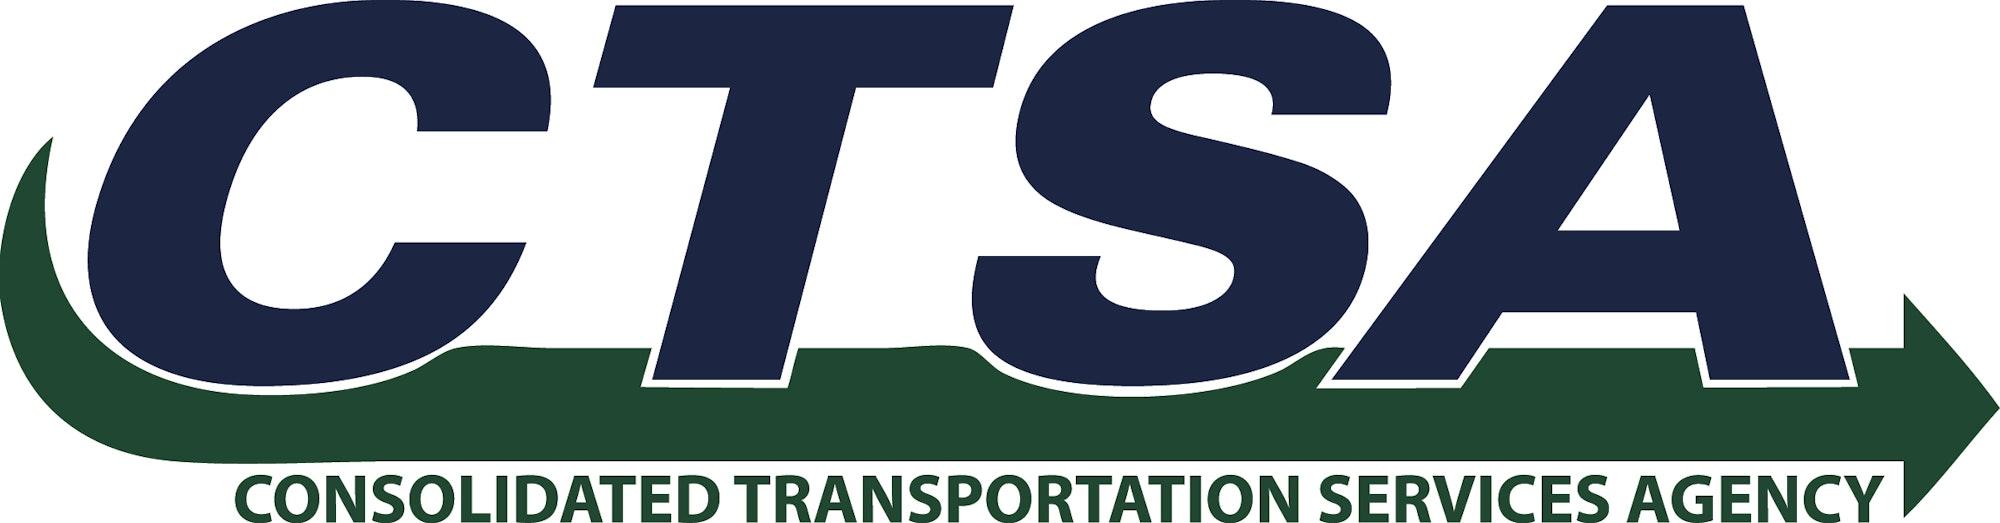 CTSA, trademark, symbol, logo, and text